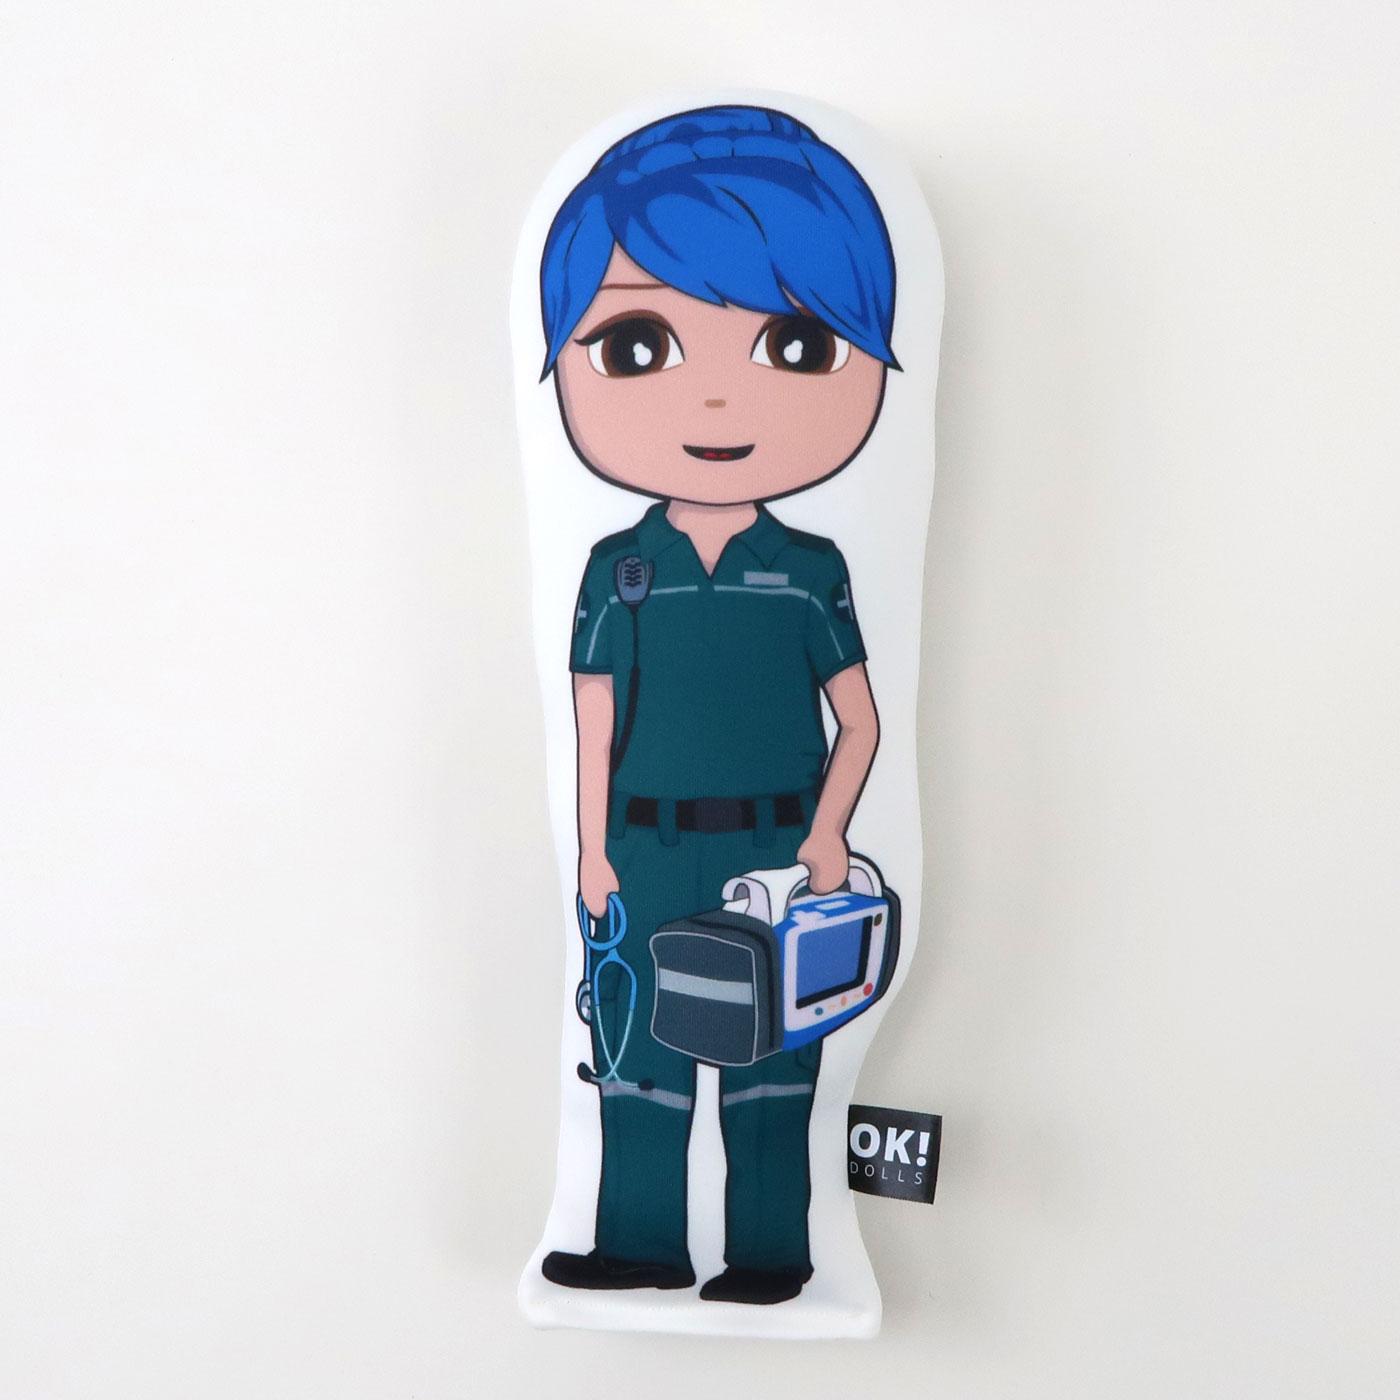 Priya Paramedic plush doll in honey